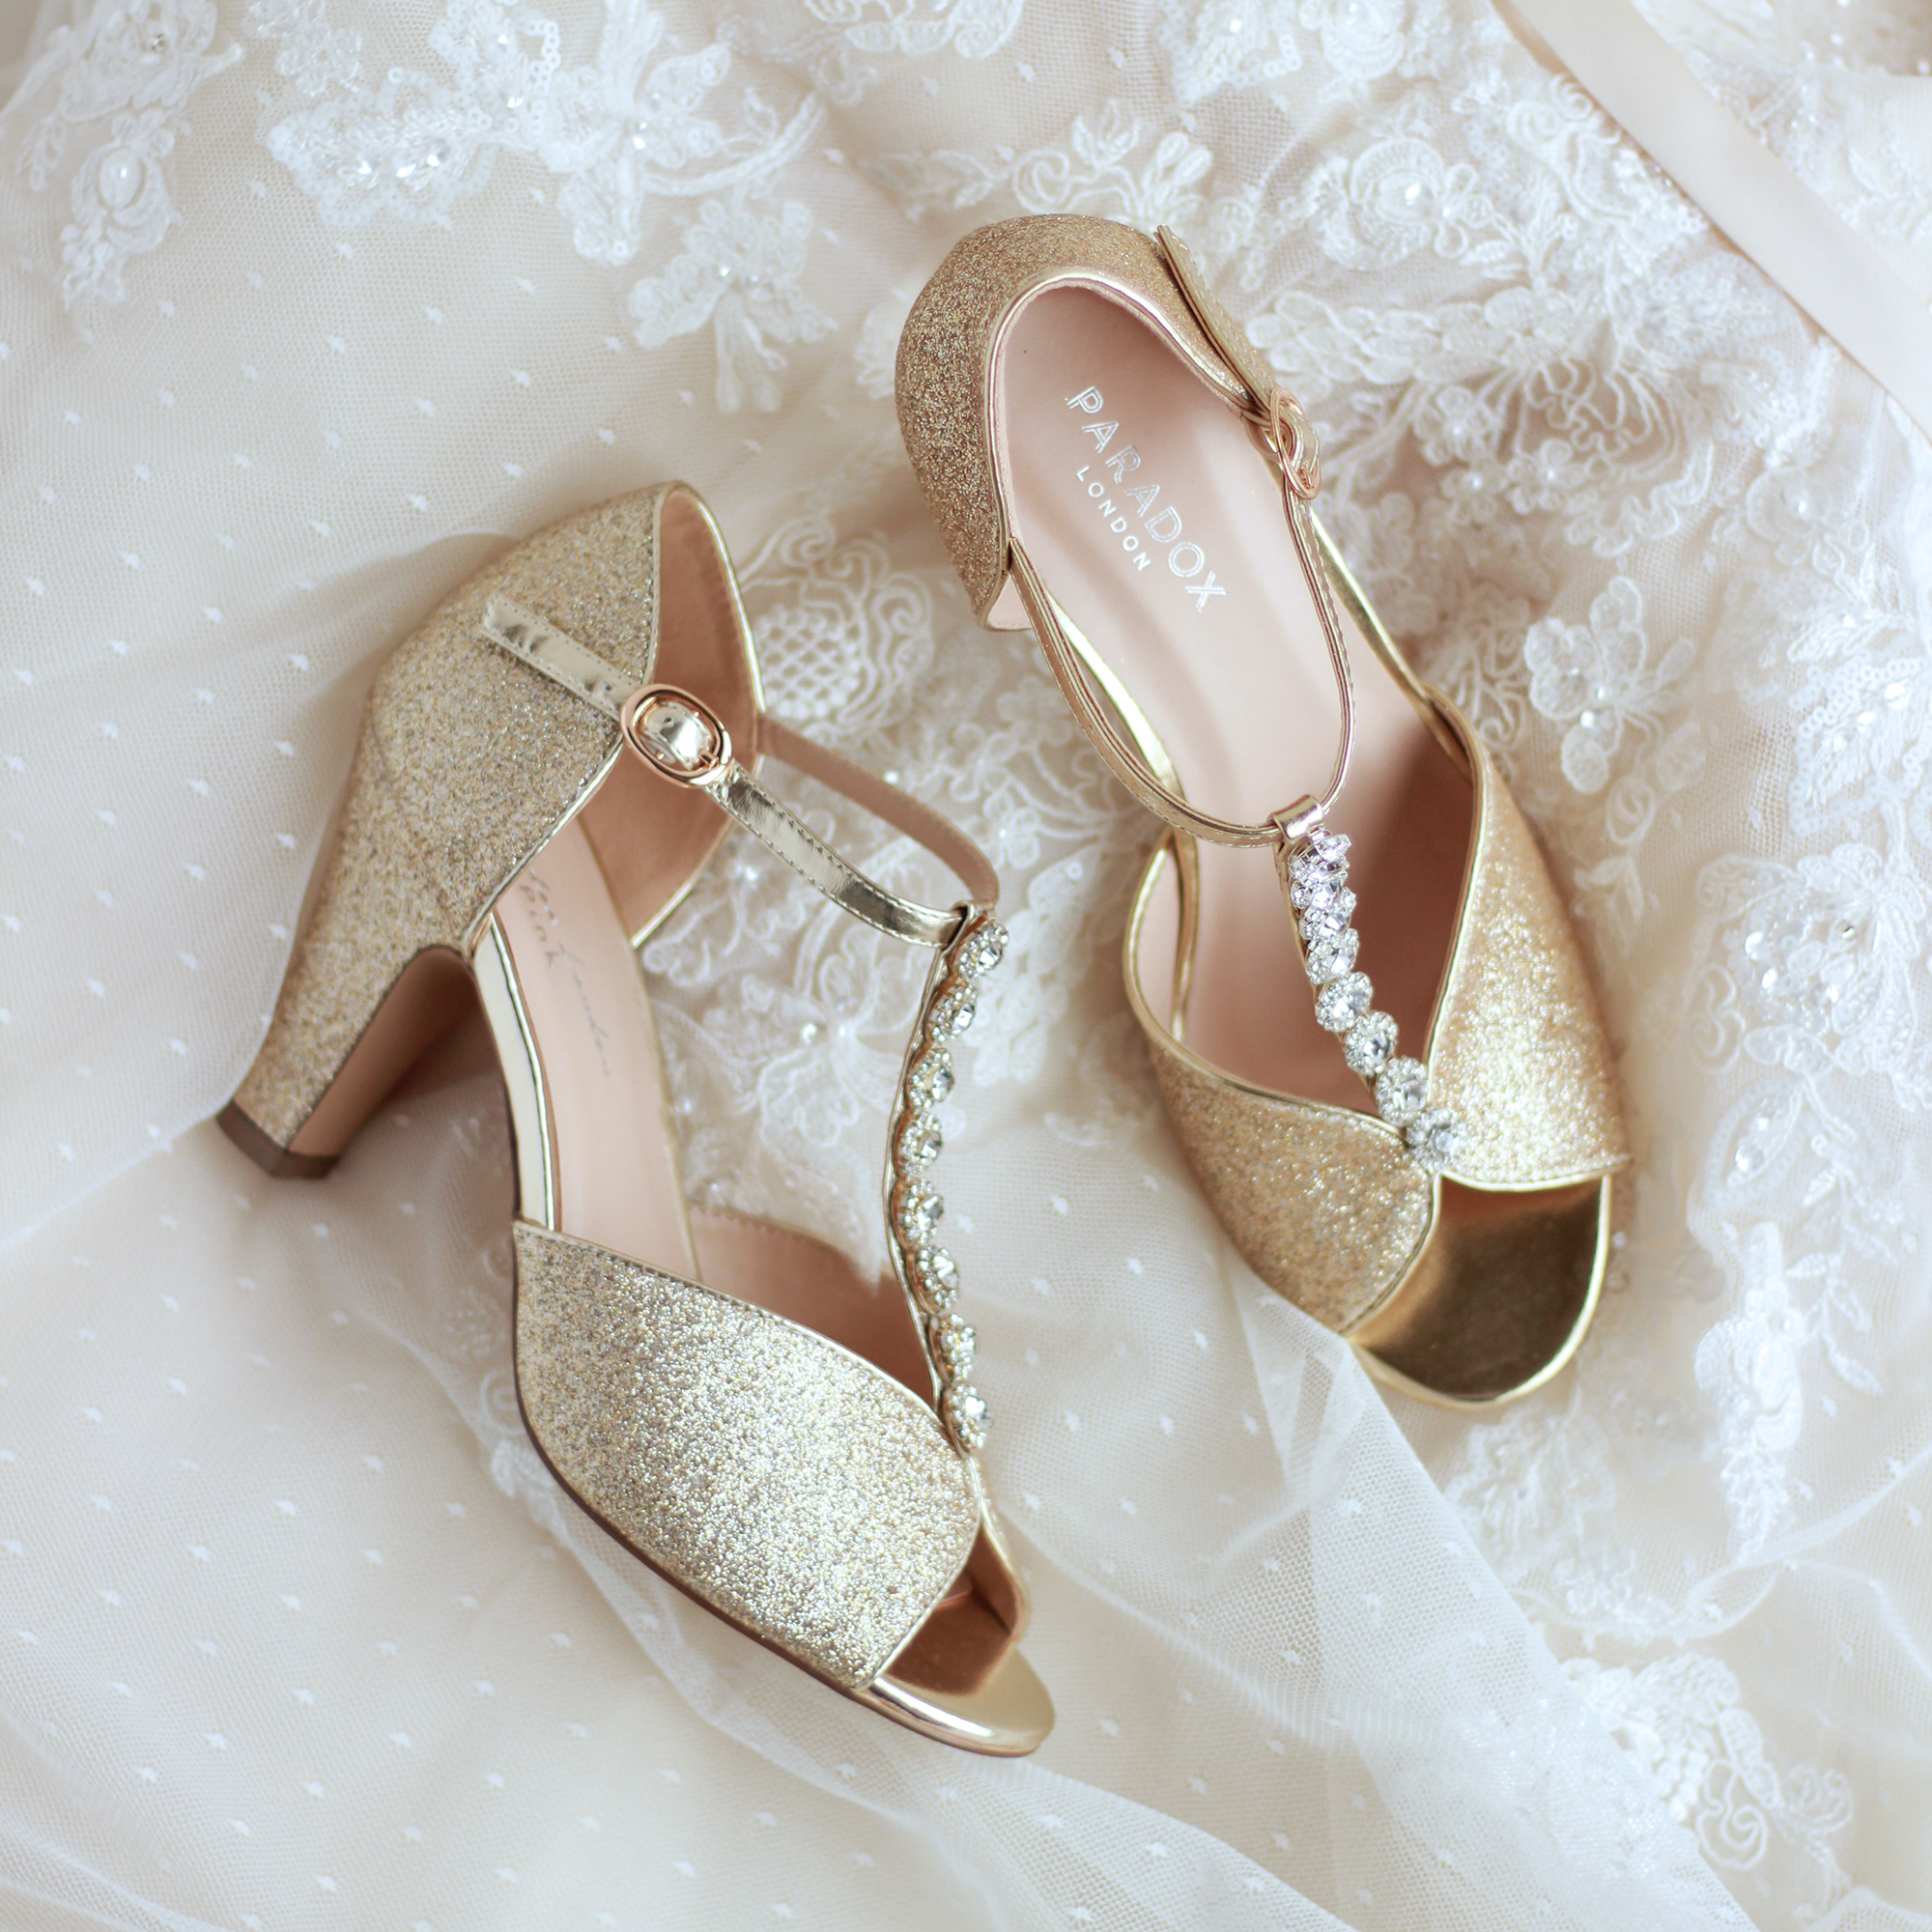 Paradox London: Modern, Affordable & Stylish Wedding Shoes